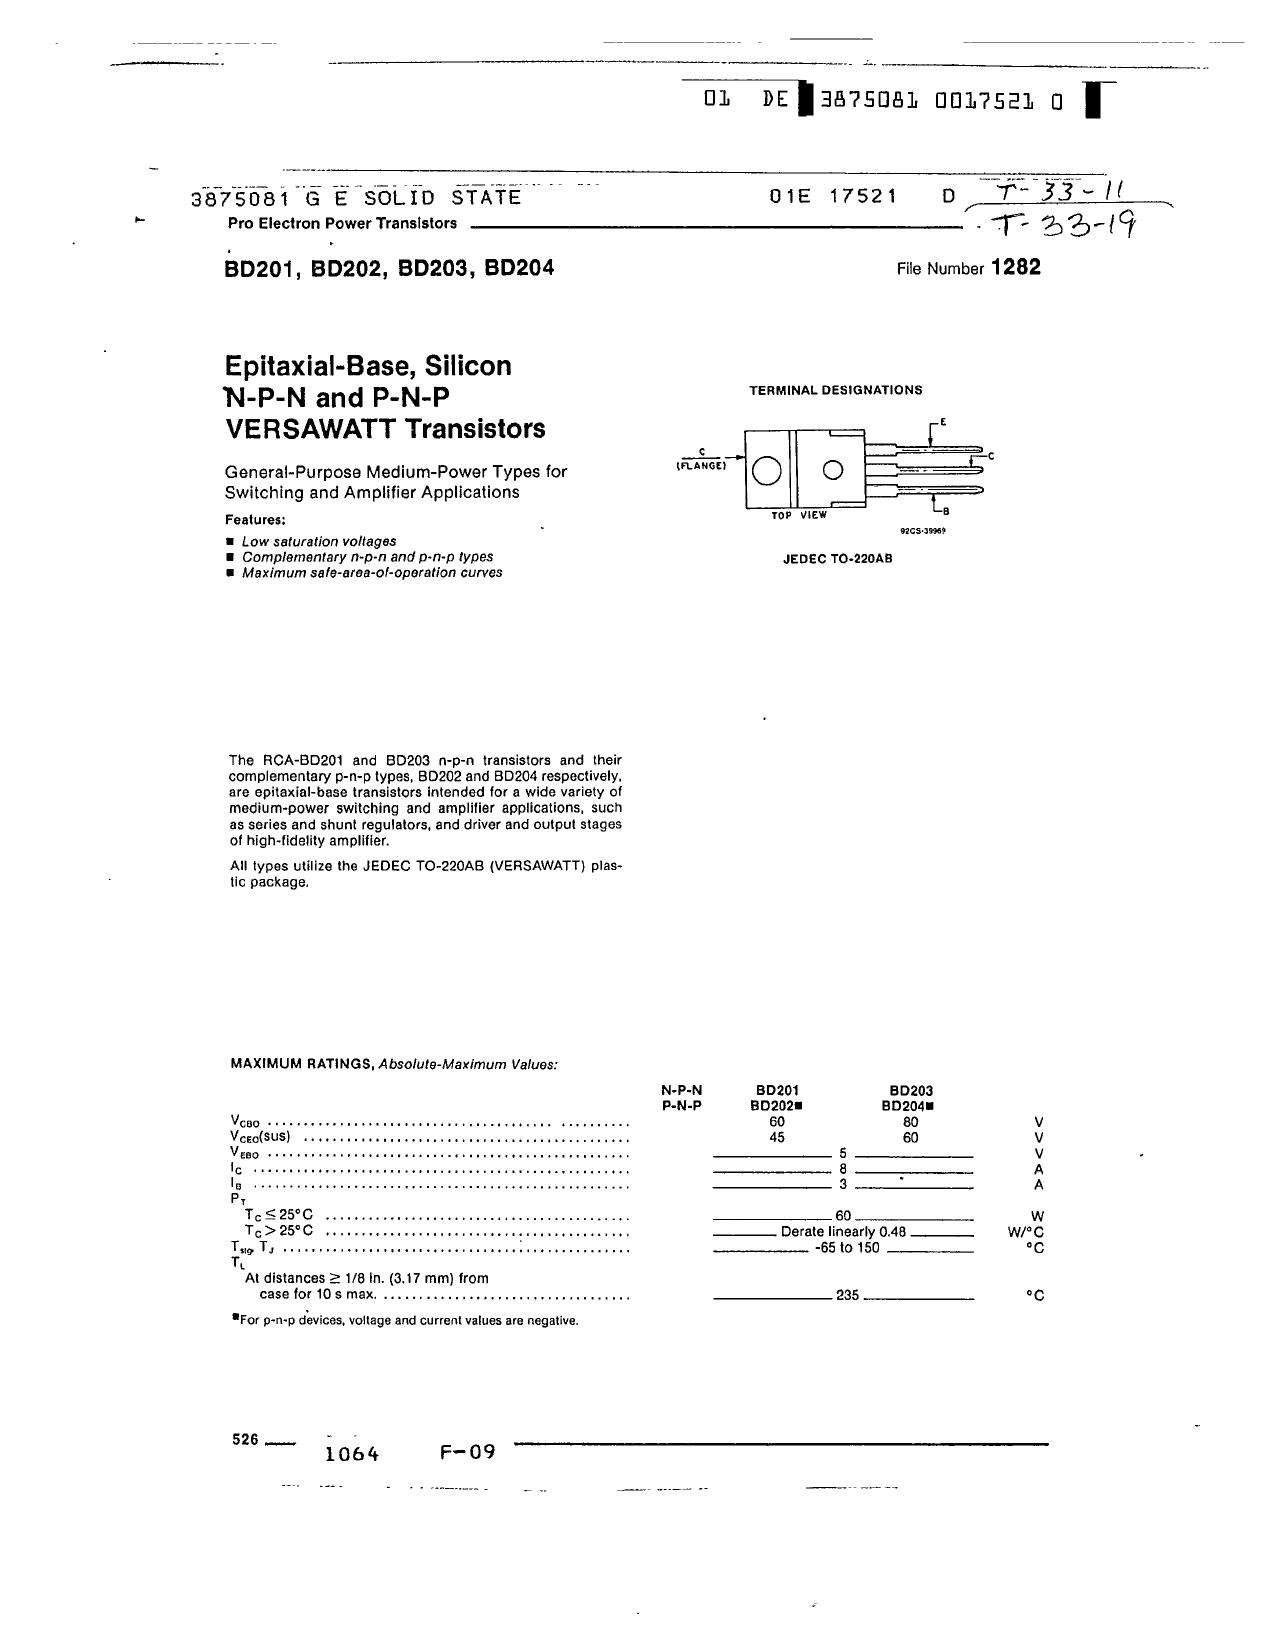 BD201 Datasheet, BD201 PDF,ピン配置, 機能